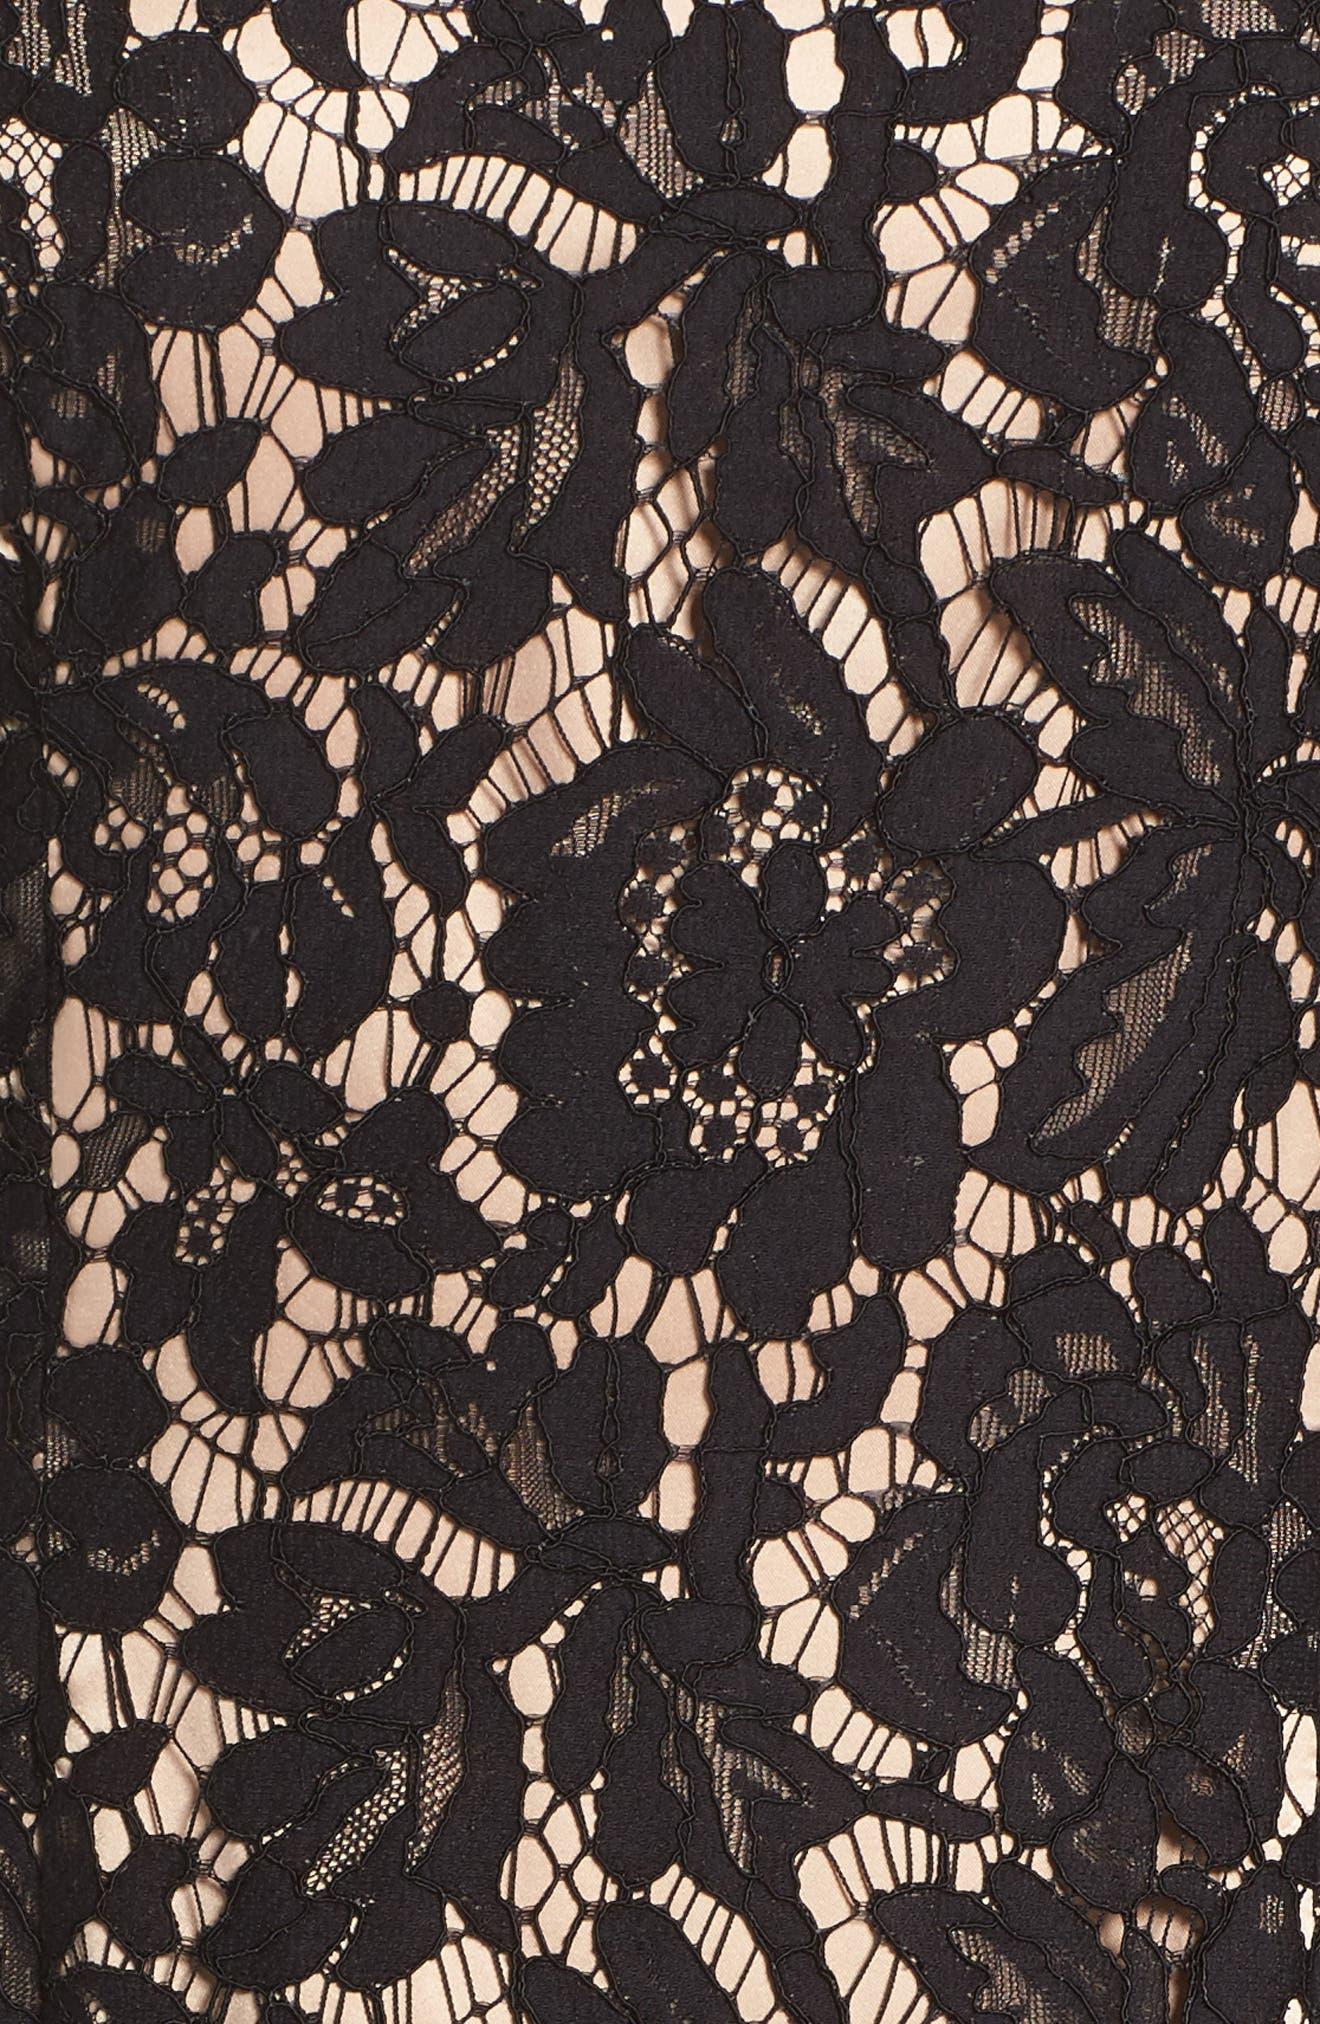 Off the Shoulder Lace Dress,                             Alternate thumbnail 5, color,                             Black/ Nude Combo